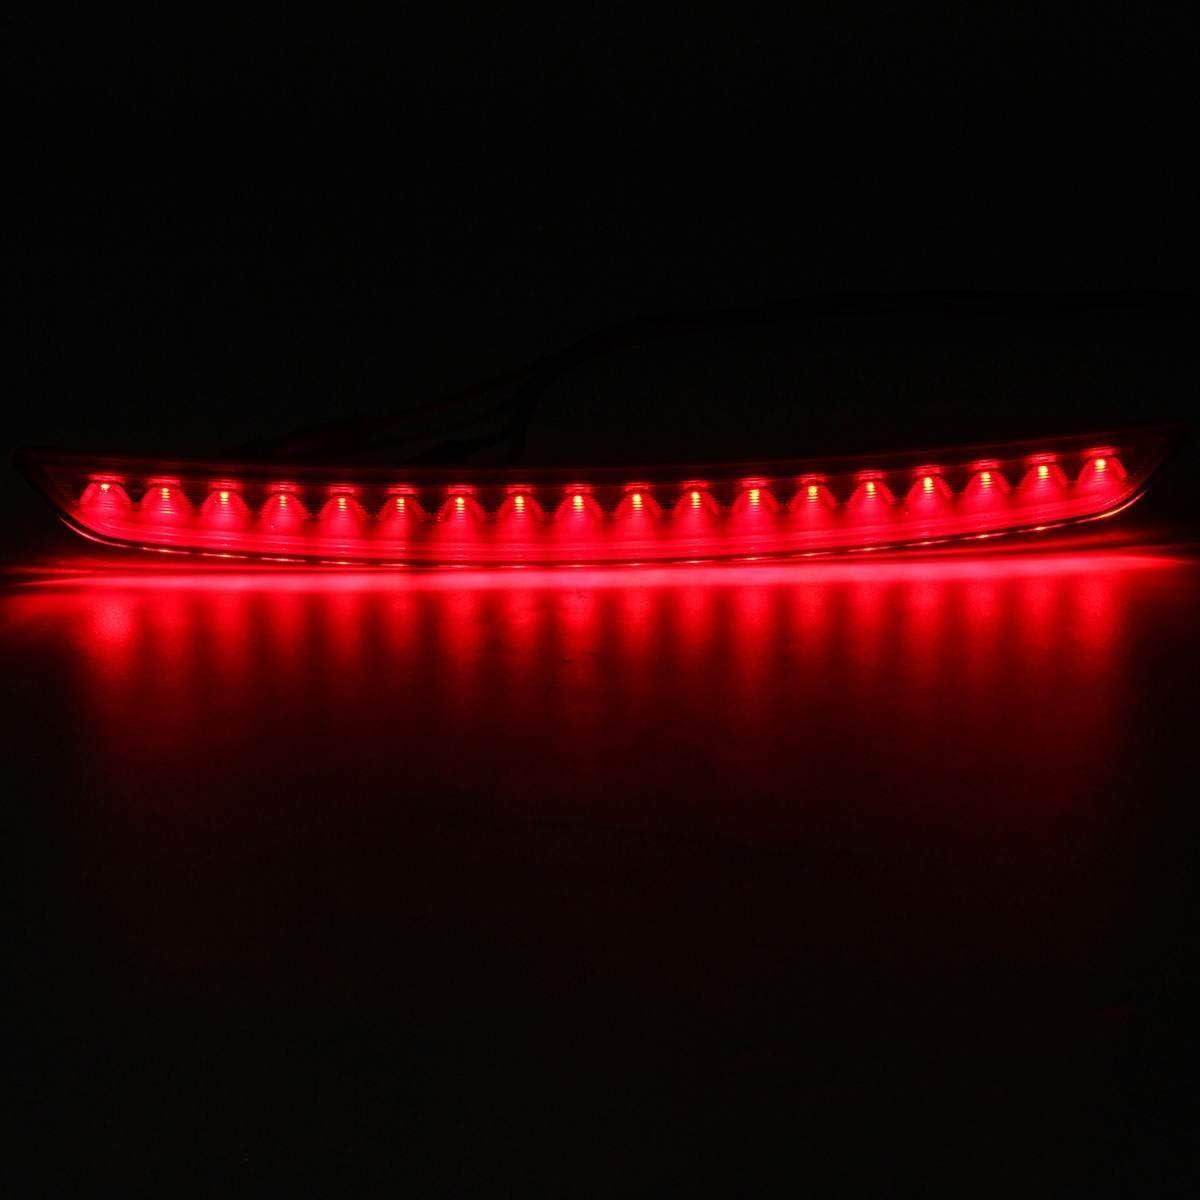 TOOGOO pour MK2 TT Lumi/èRe de Frein Haute LED Niveau Frein Feu Arri/èRe Feu Arri/èRe Lampe pour MK2 TT 8J0945097